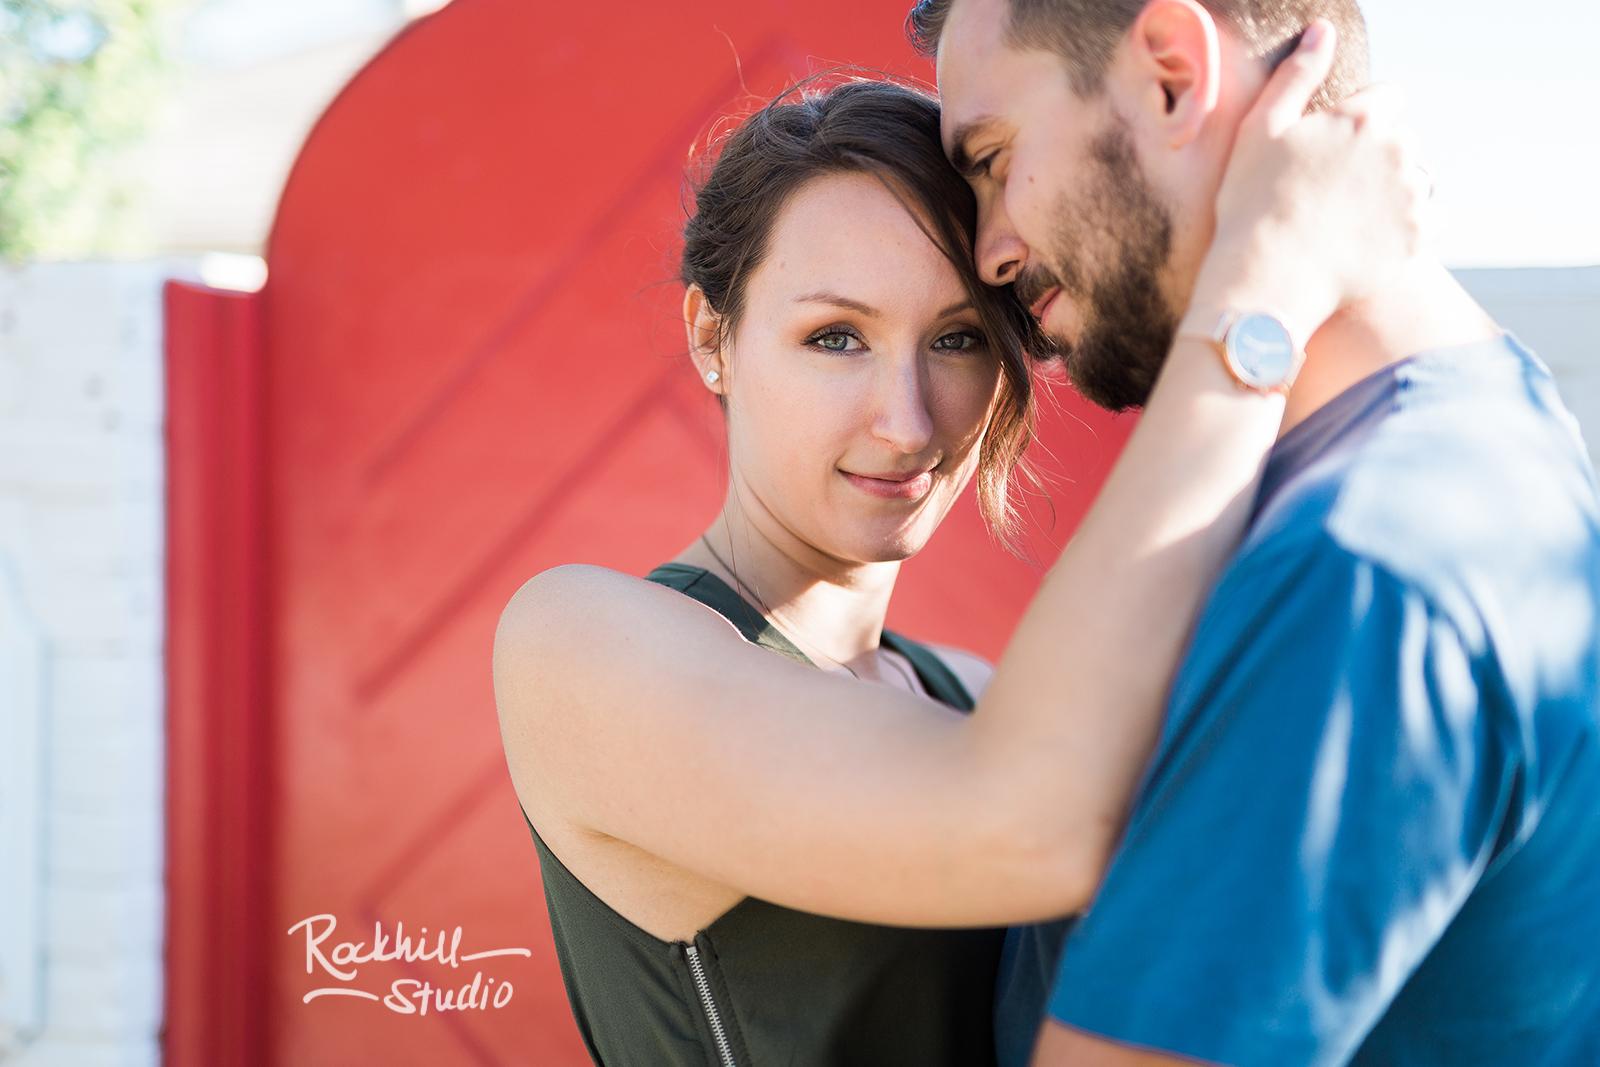 mackinac-island-wedding-engagement-northern-michigan-rockhill-studio-jt-12.jpg